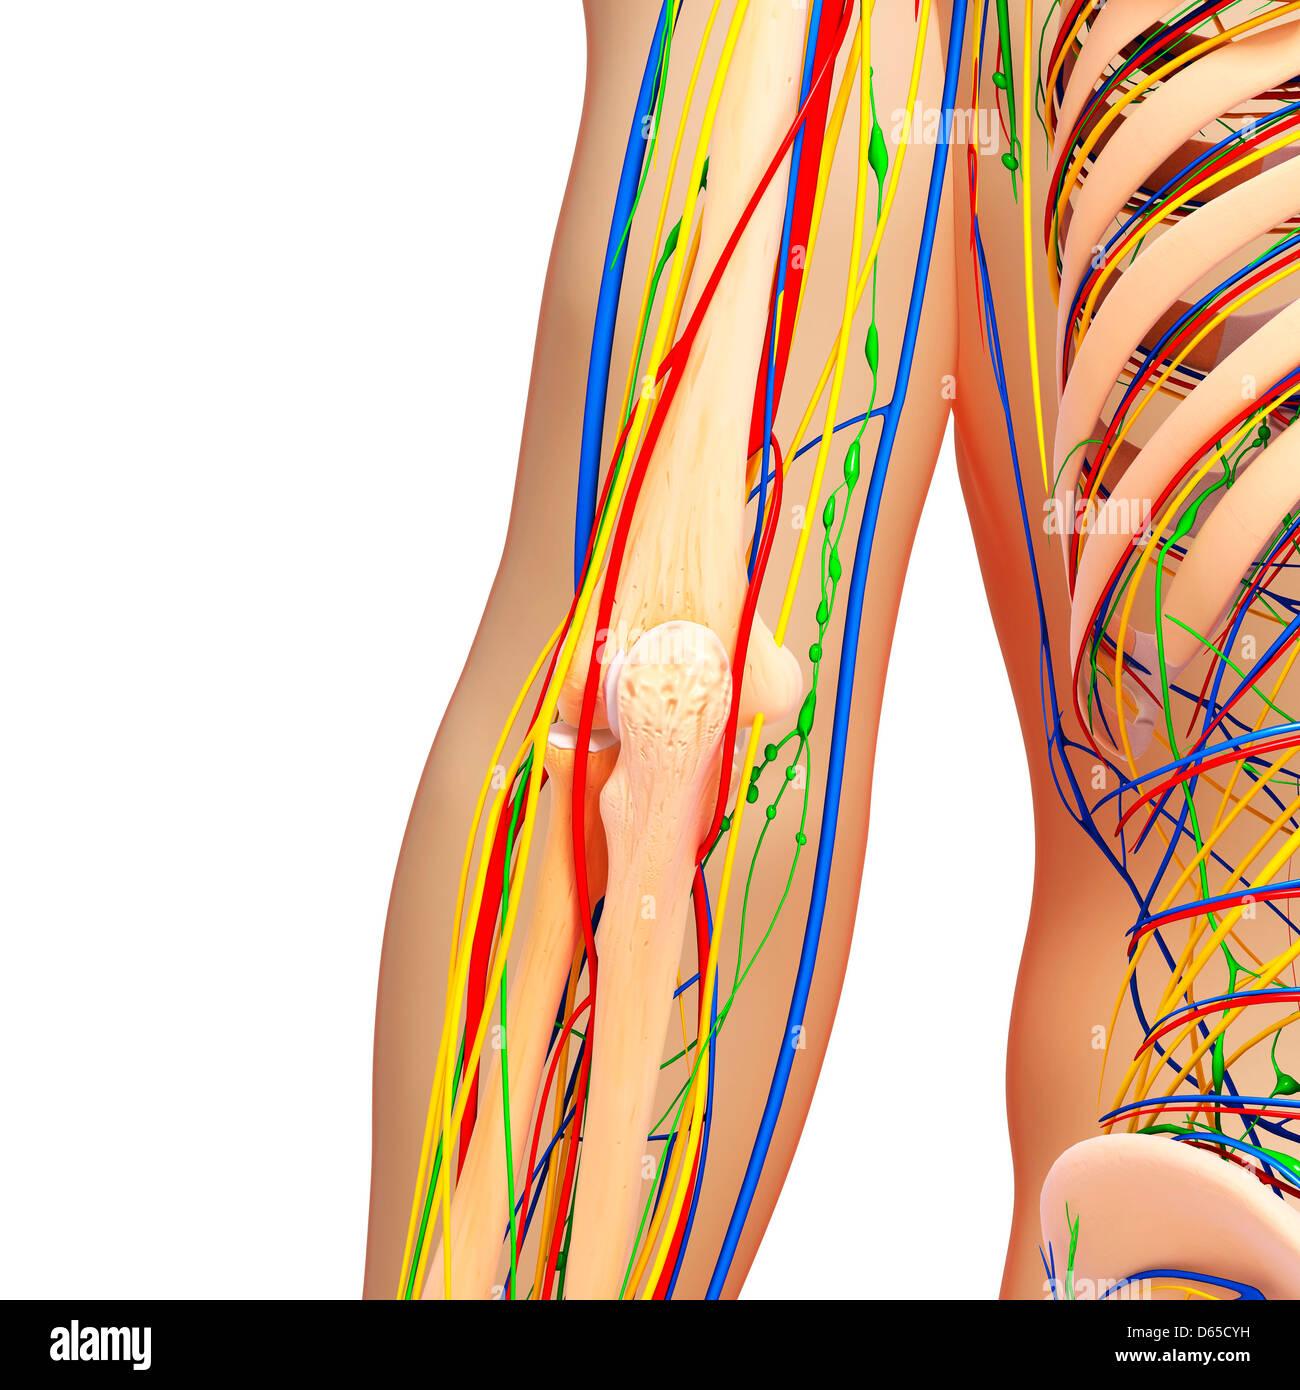 Ellenbogen Anatomie, Kunstwerk Stockfoto, Bild: 55438981 - Alamy